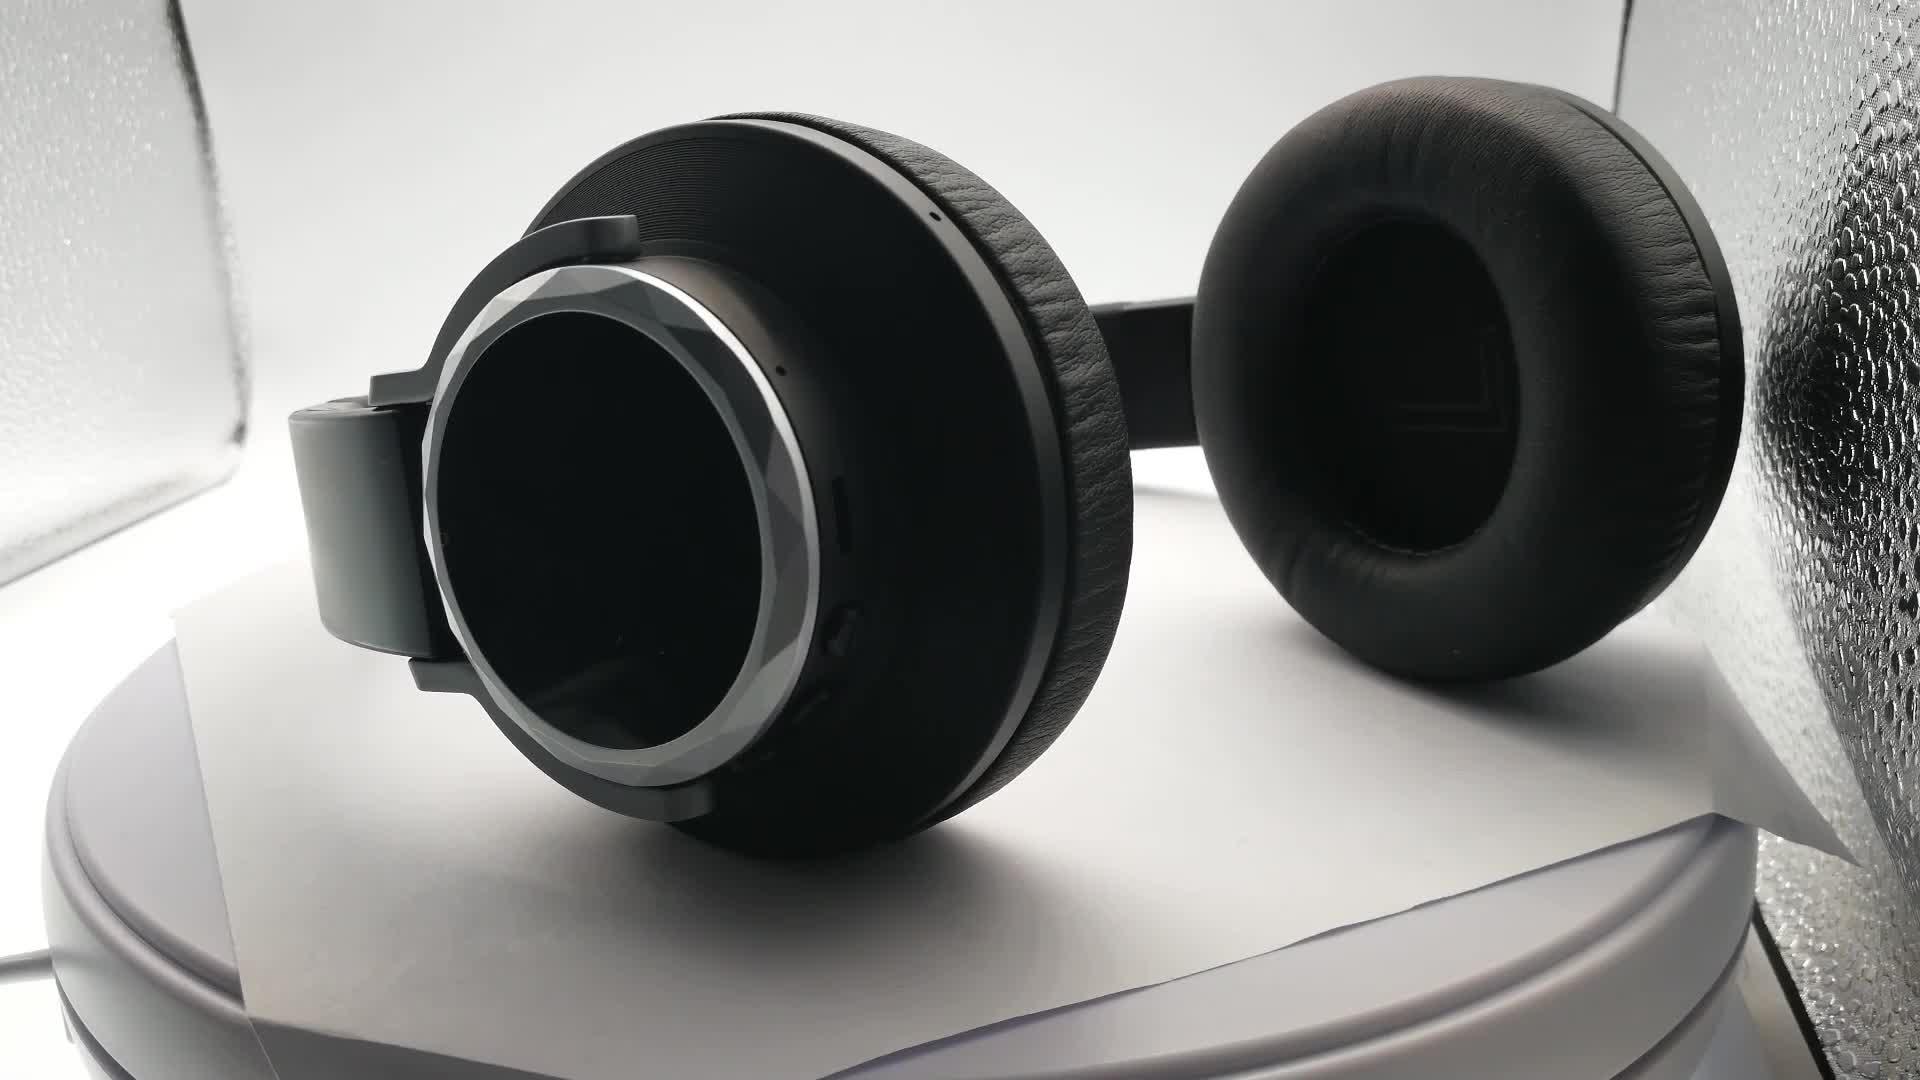 Yeni OEM / ODM fabrika özel M80 Bluetooth Kulaklıklar Kablosuz KSS 4.1 Bluetooth Kulaklık Kulaklık